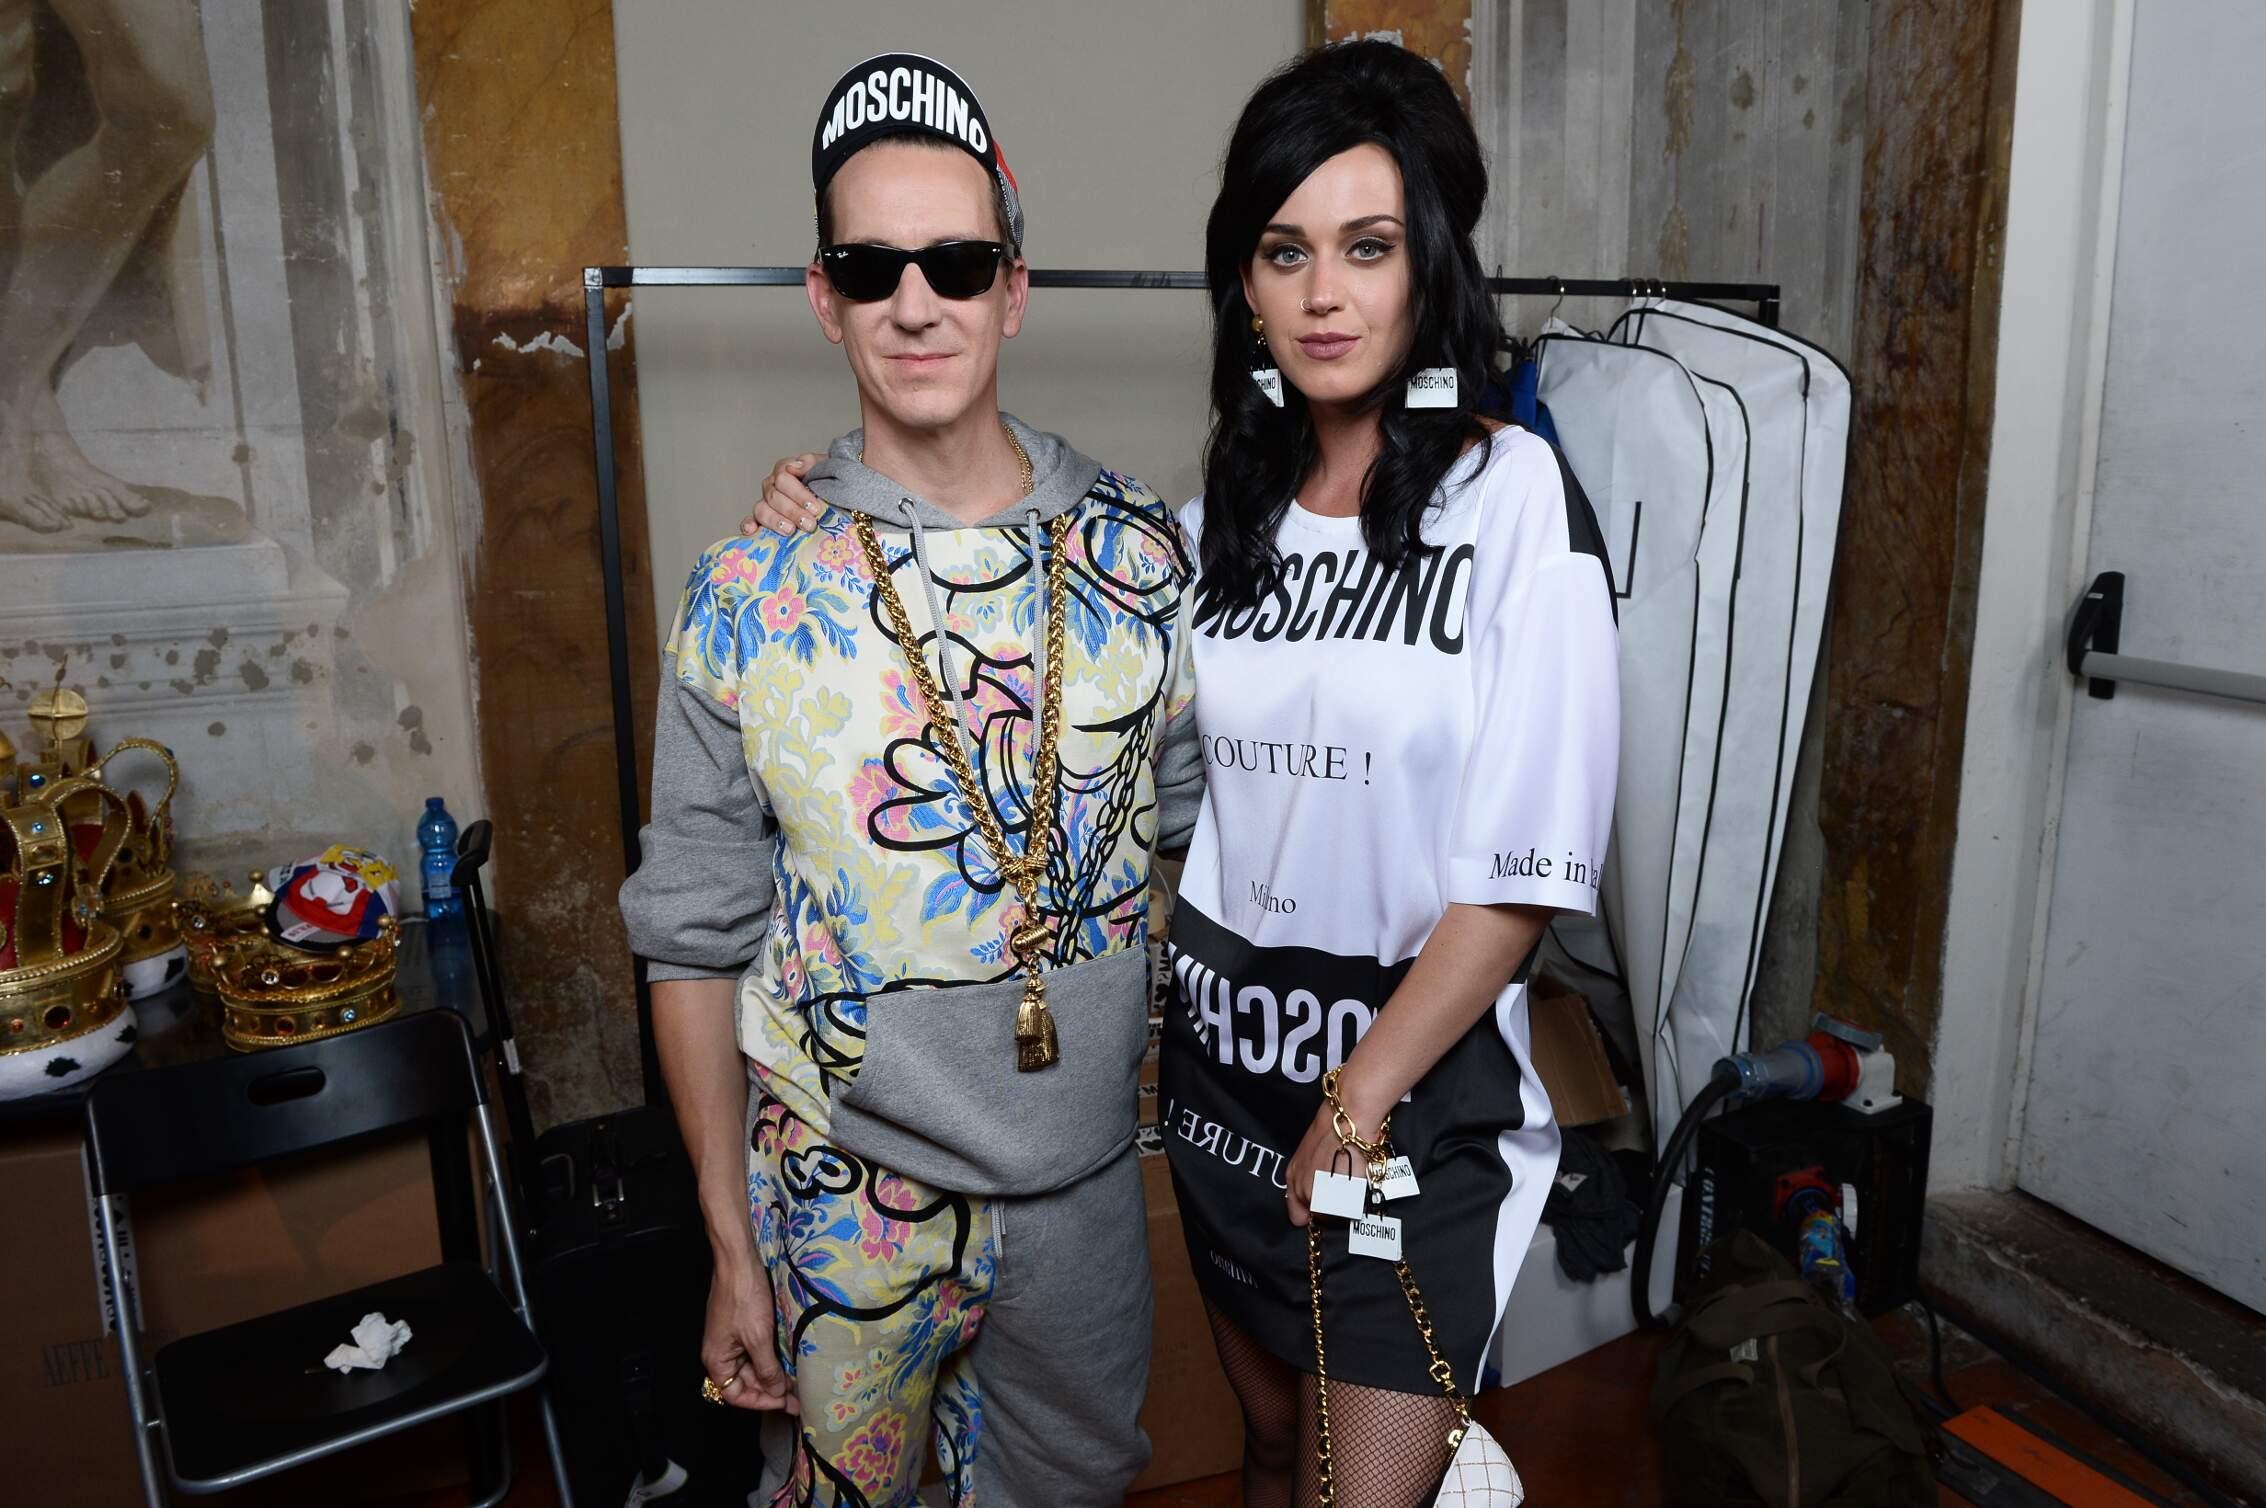 Backstage Moschino Jeremy Scott and Katy Perry Pitti Florence